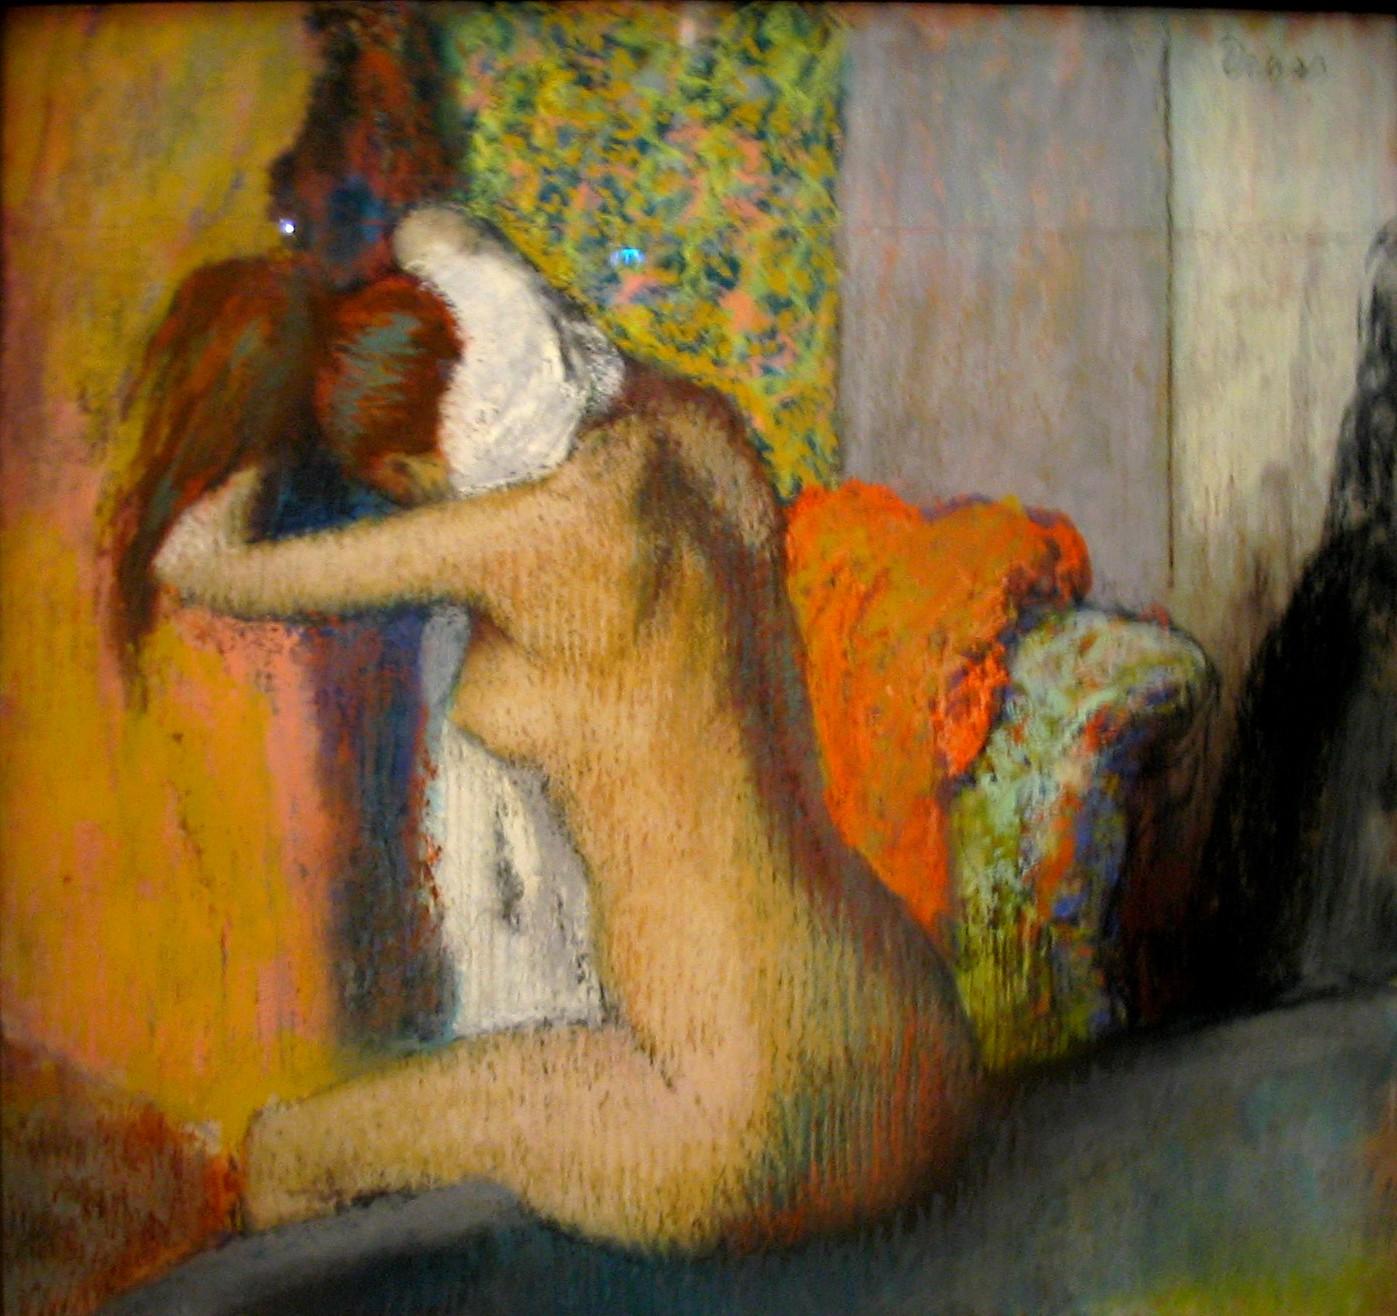 Edgar_Germain_Hilaire_Degas_045 (1)